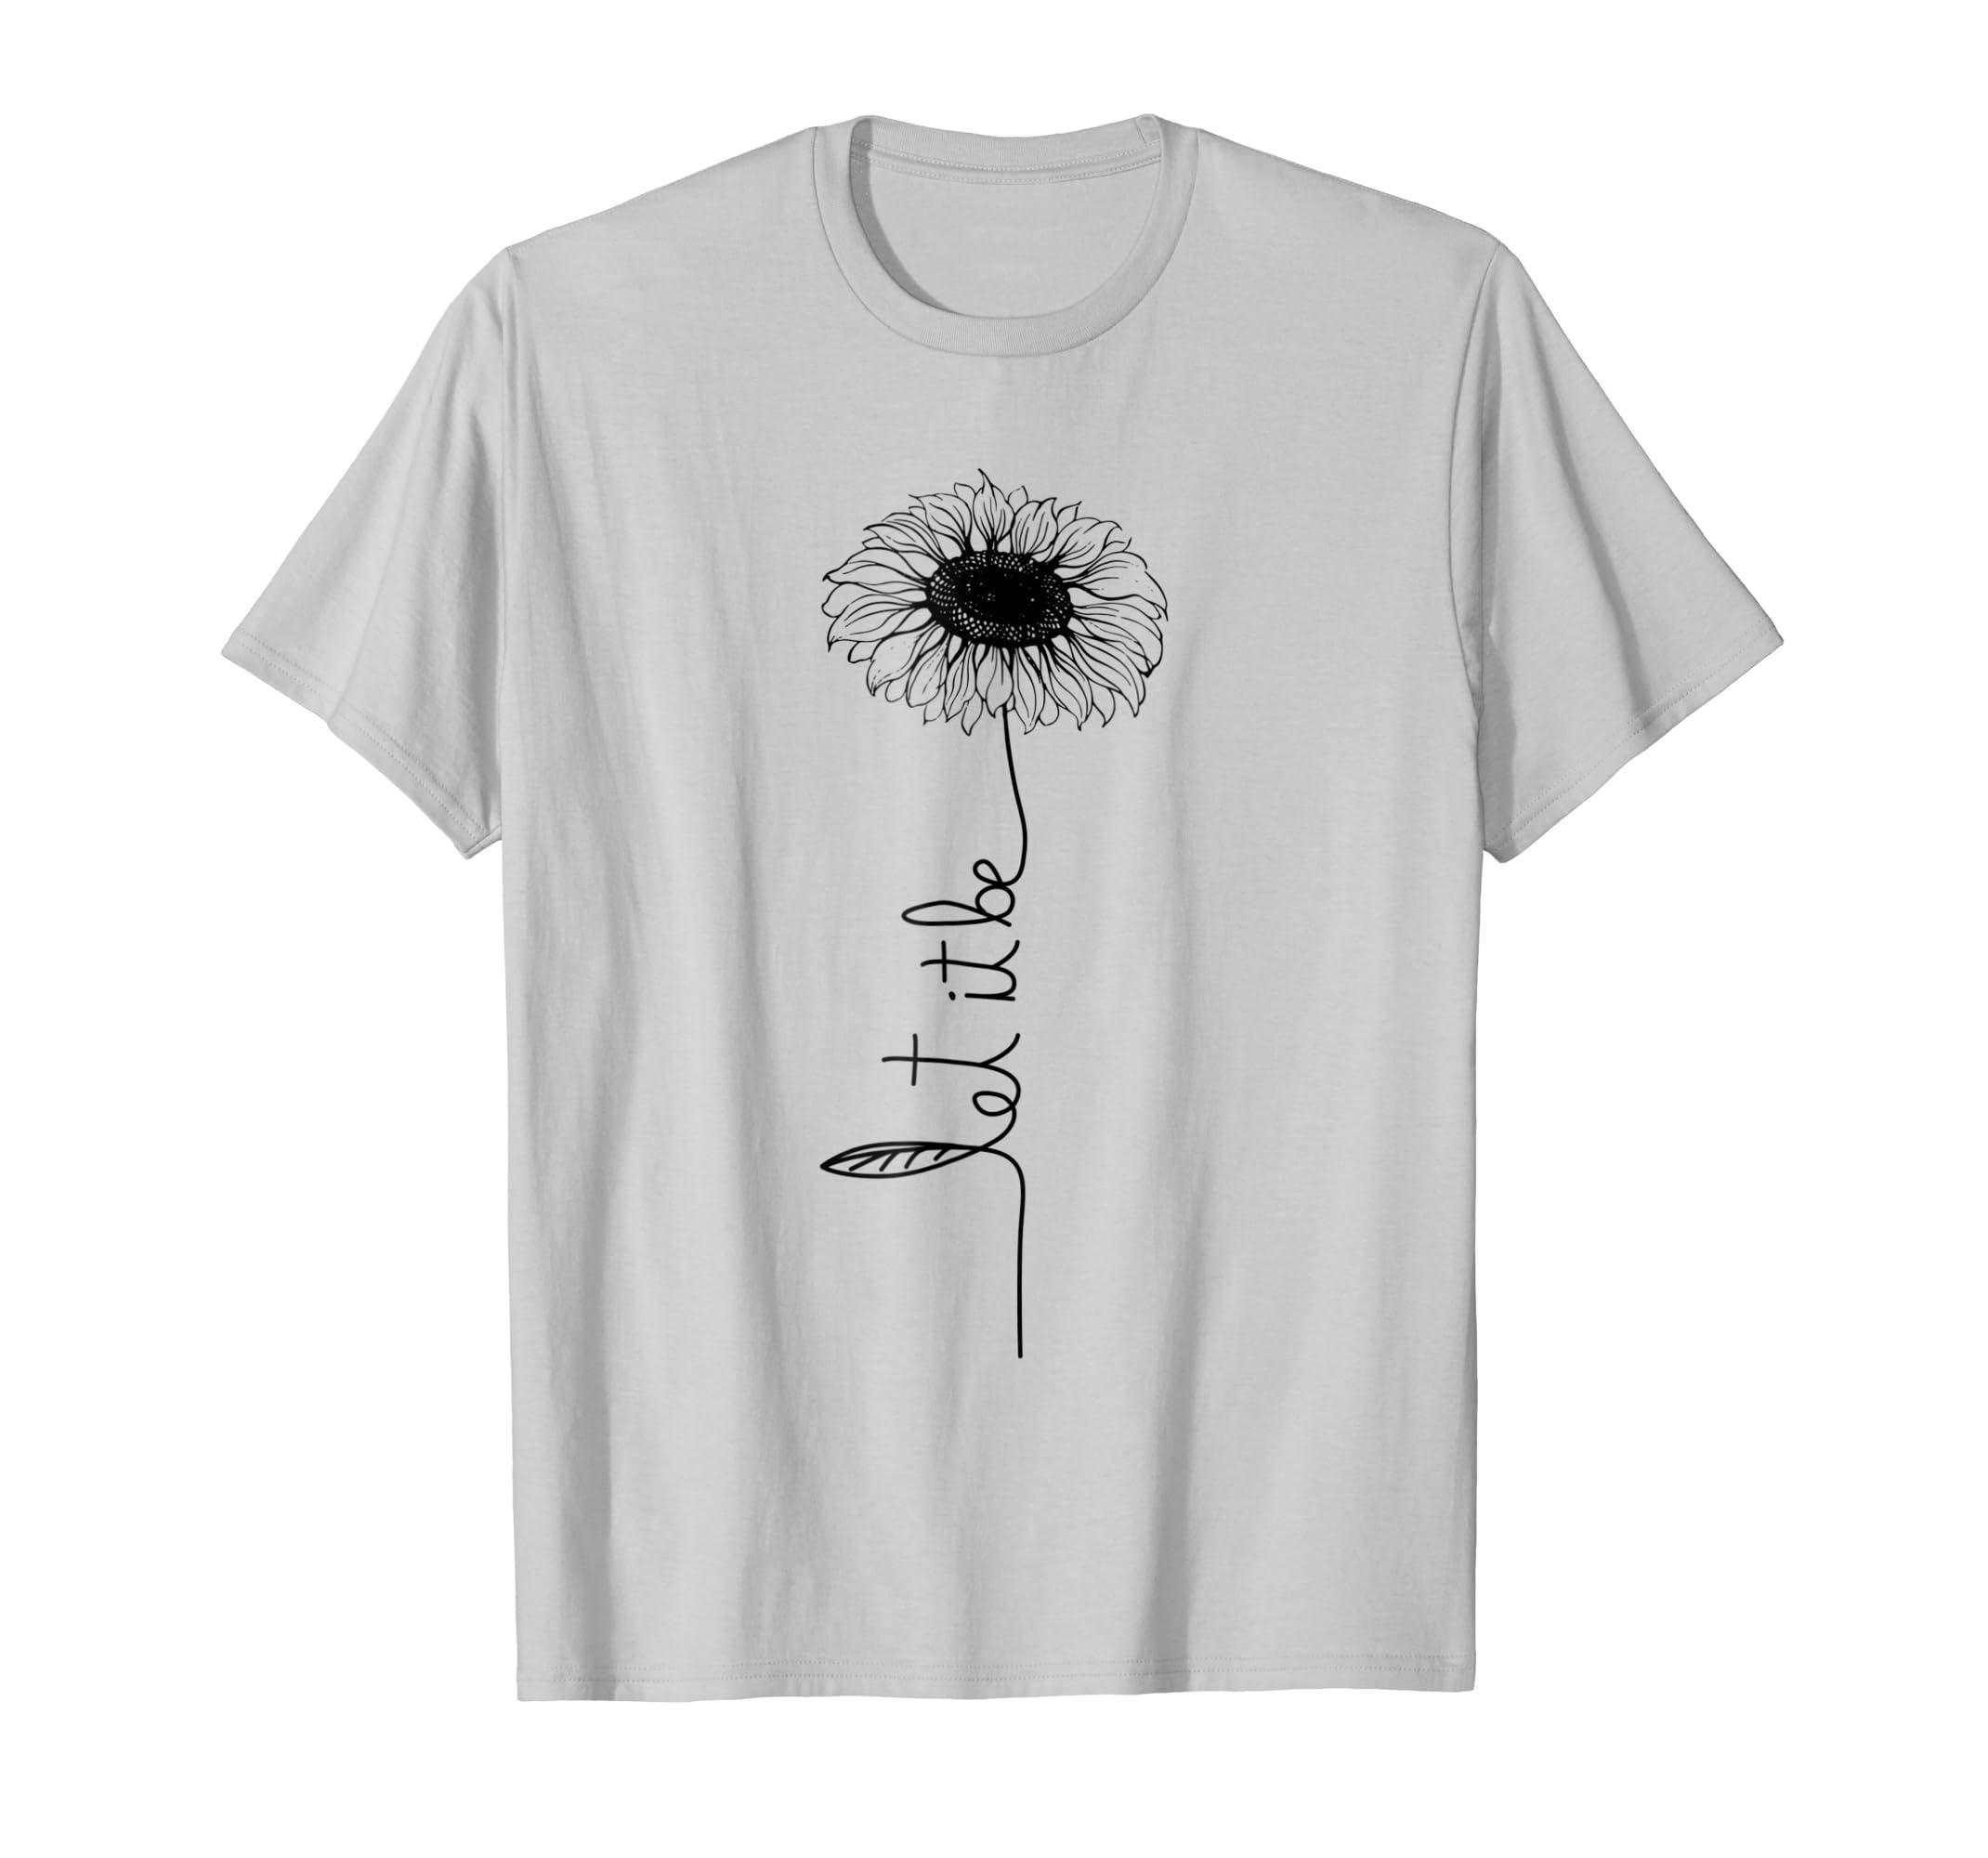 Let it be Sunflower Hippie Gypsy Soul Lover Vintage Shirt-mt